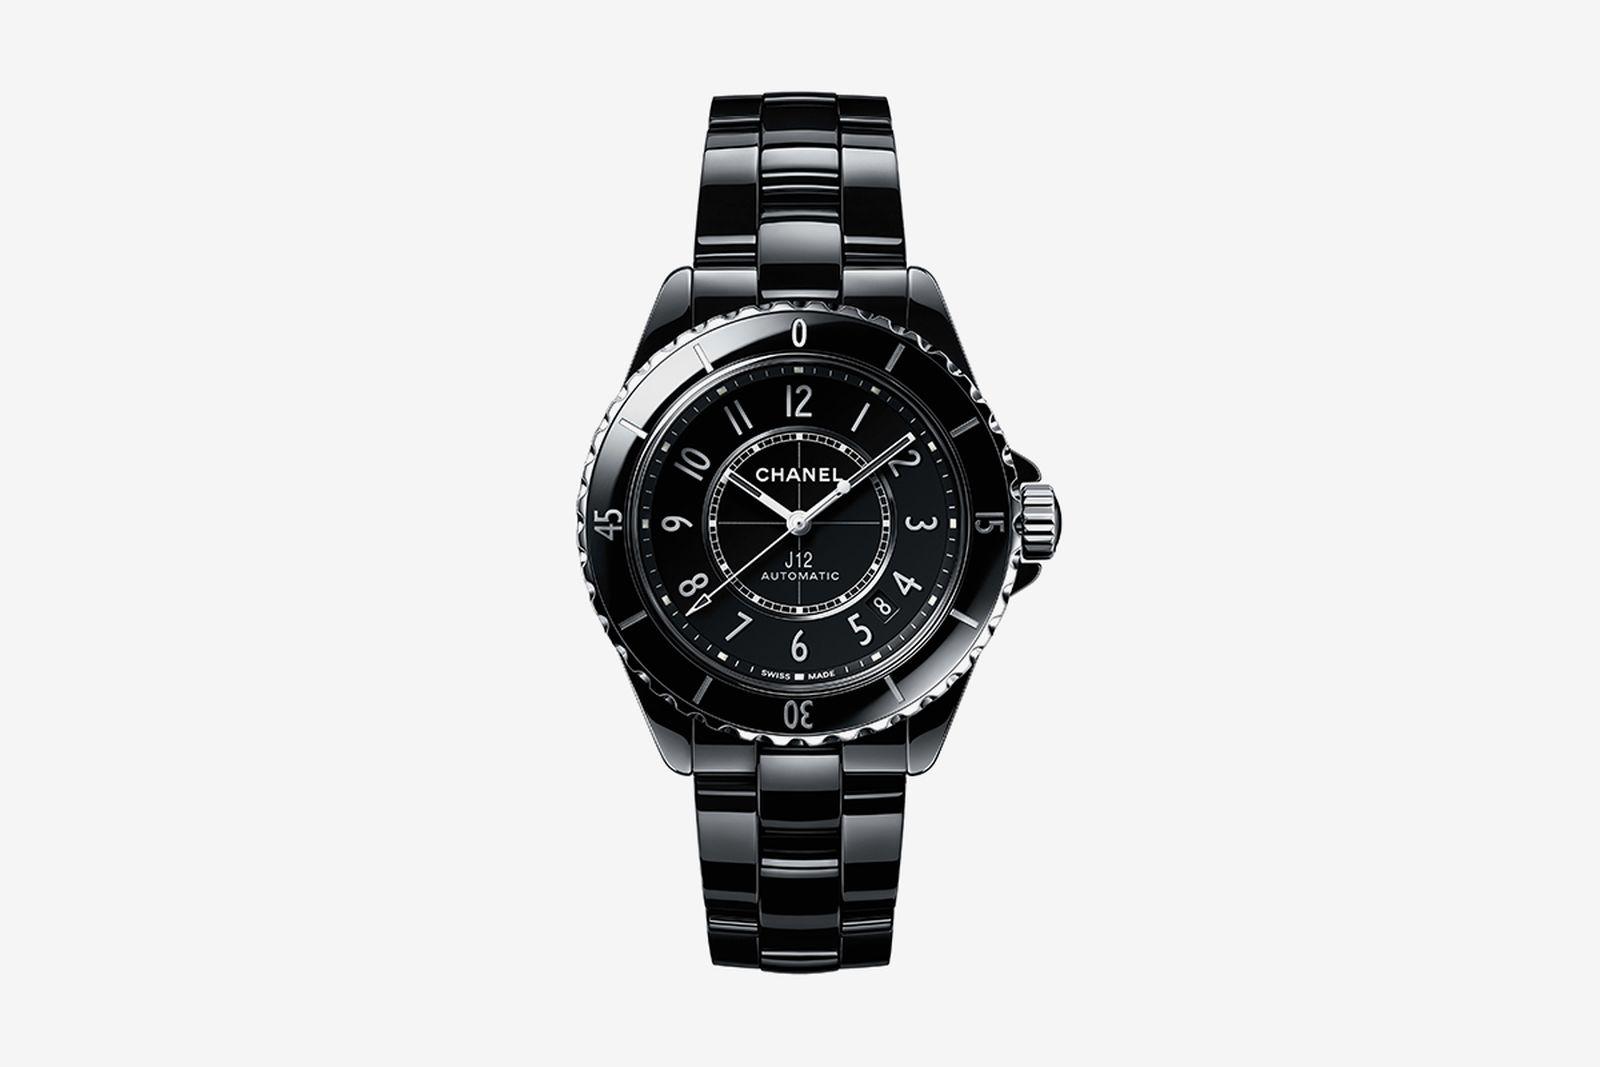 chanel j12 watch 2019